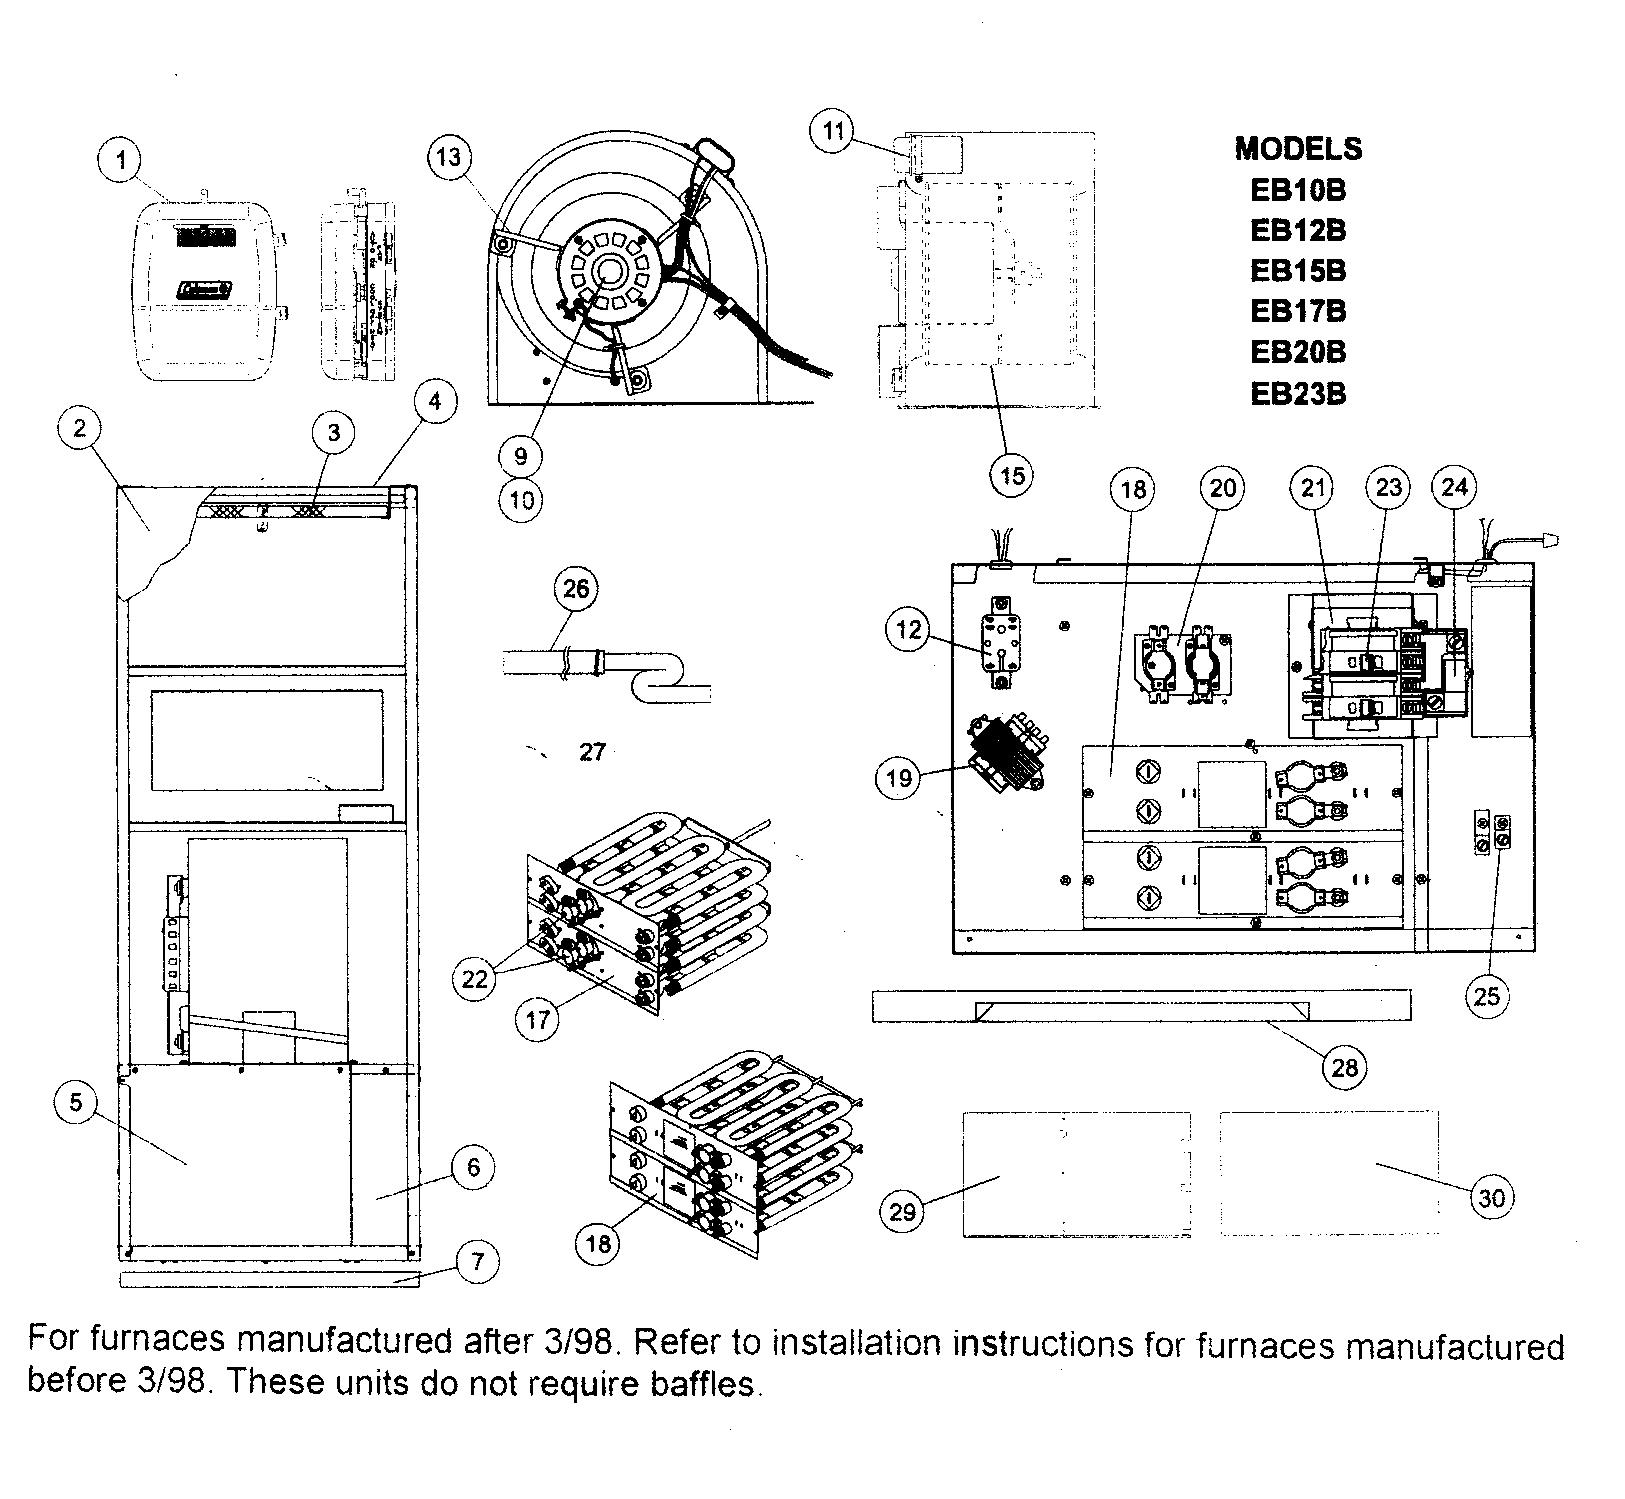 Peachy Coleman Electric Air Handler Wiring Diagram Wiring Diagram M6 Wiring Cloud Onicaalyptbenolwigegmohammedshrineorg